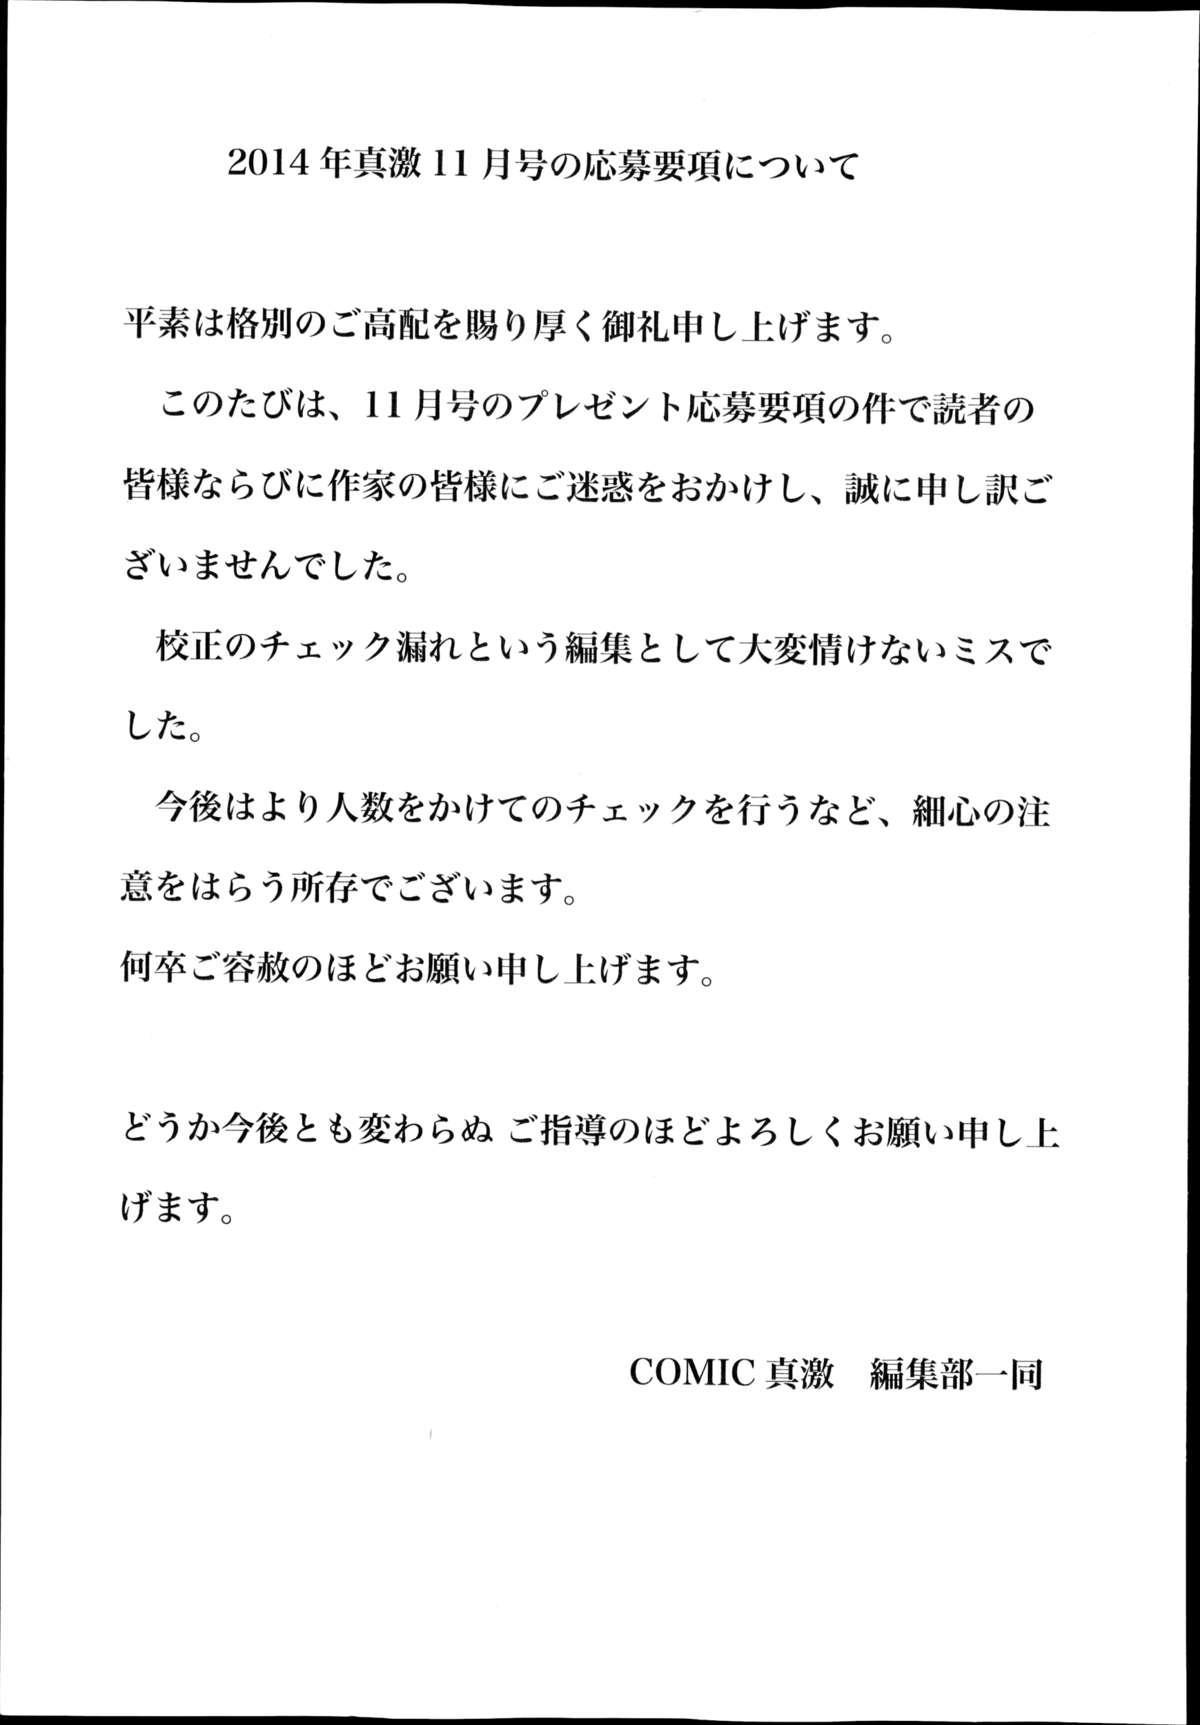 COMIC Shingeki 2014-12 328